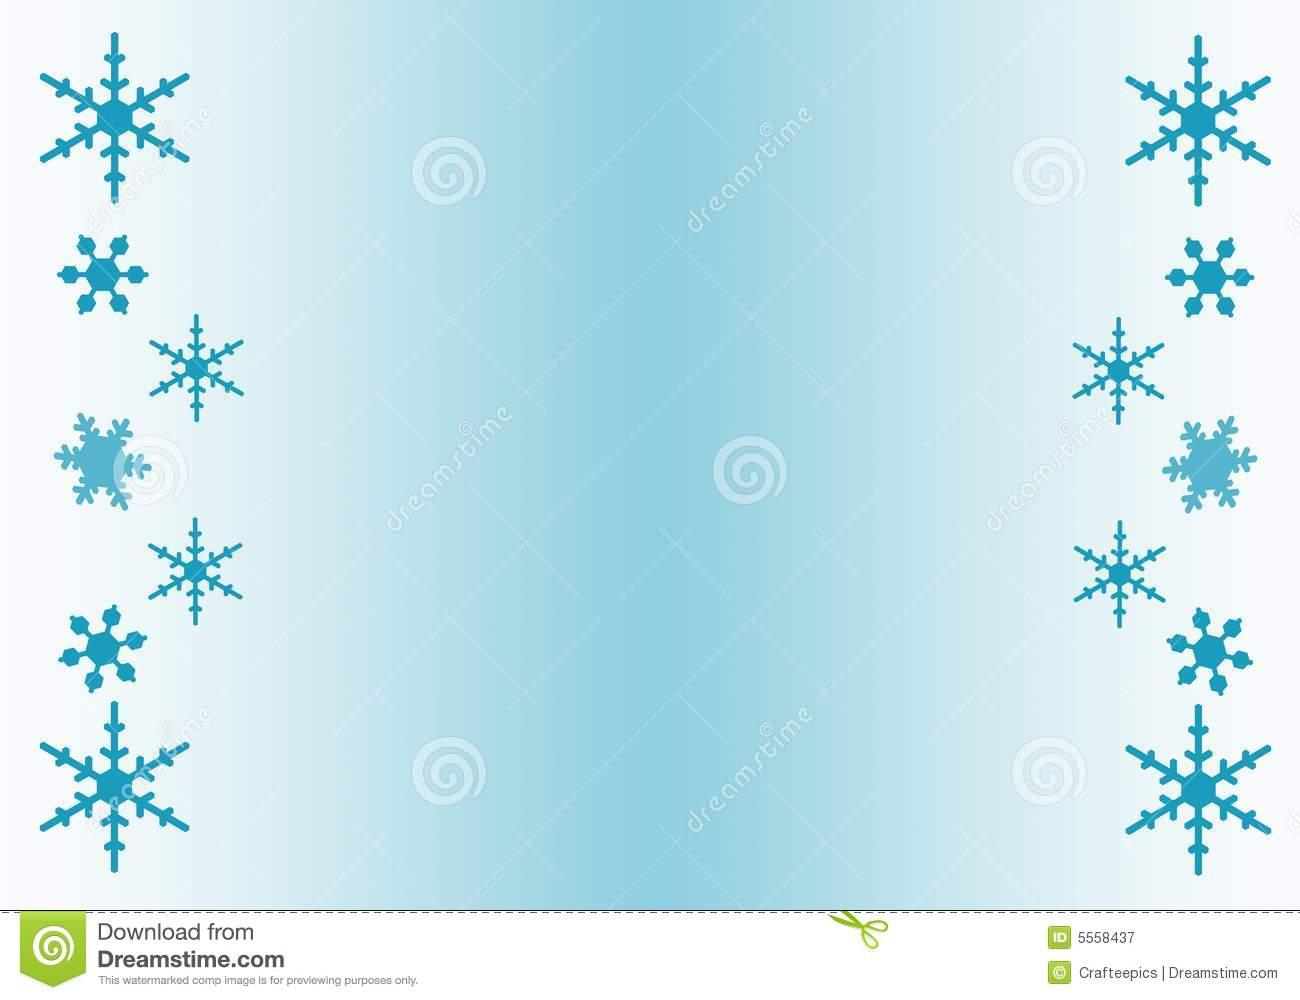 Snowflake Clipart Border .